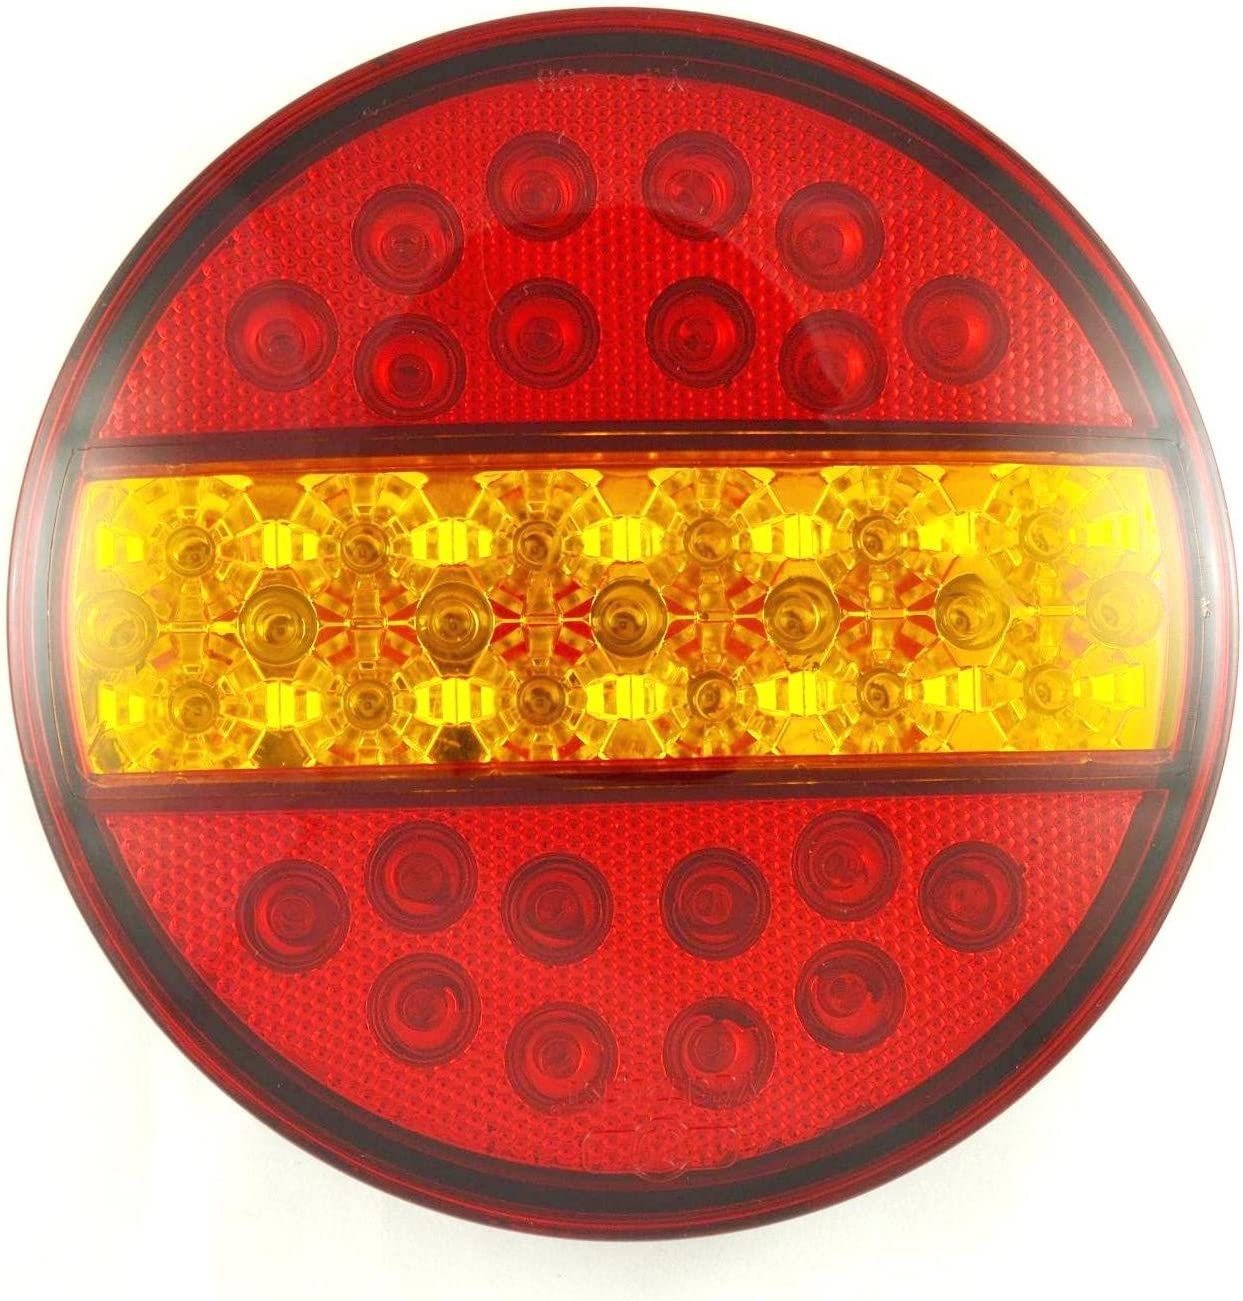 4x LED Hamburger Stop Tail Lights 24V Truck Trailer Chassis Caravan Tipper universal